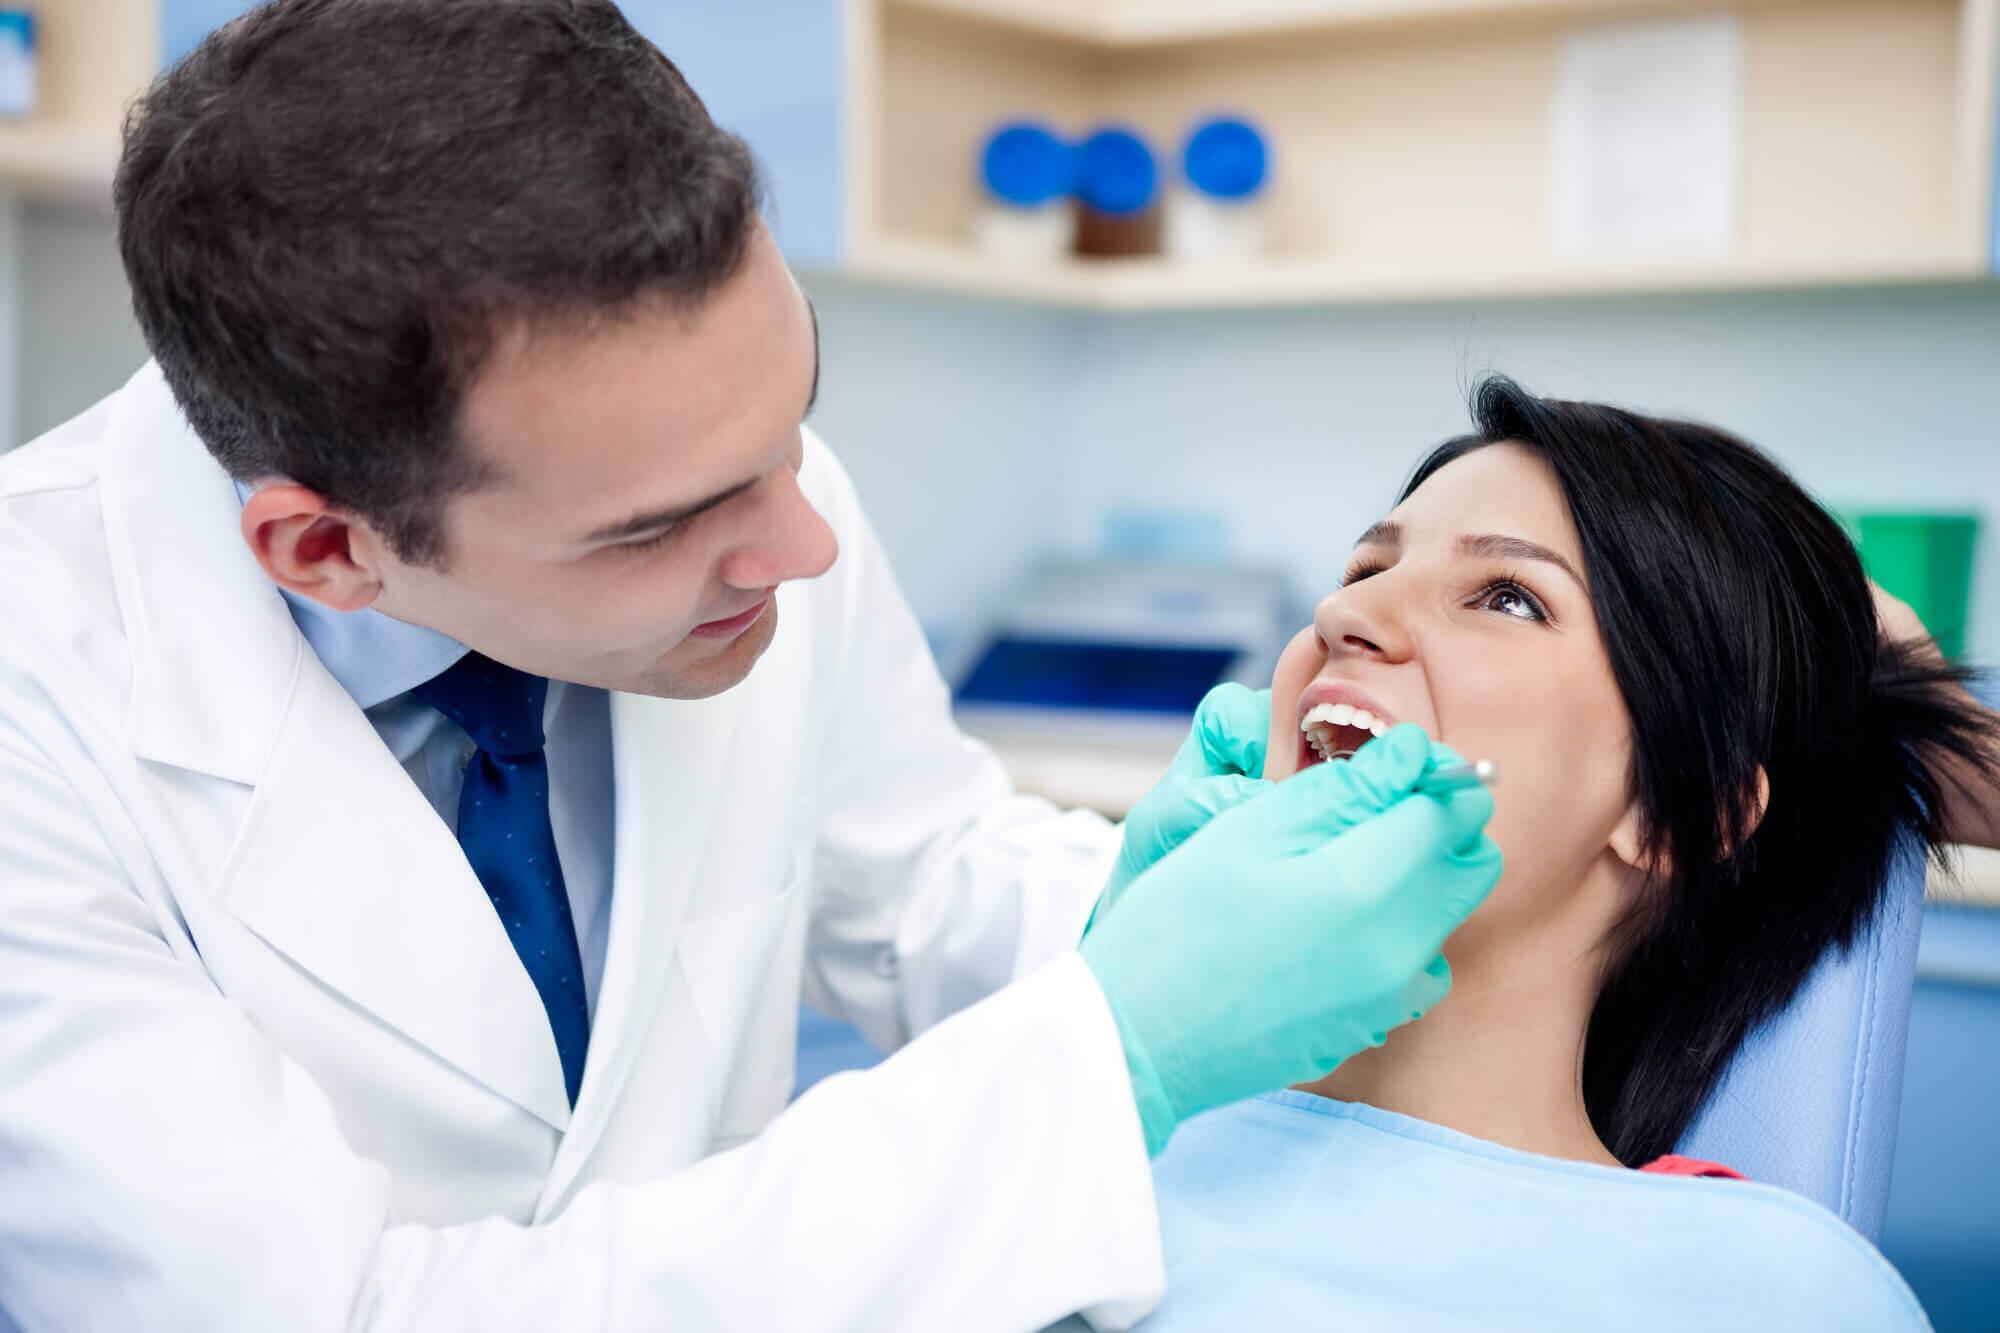 where is the best aventura dentist?